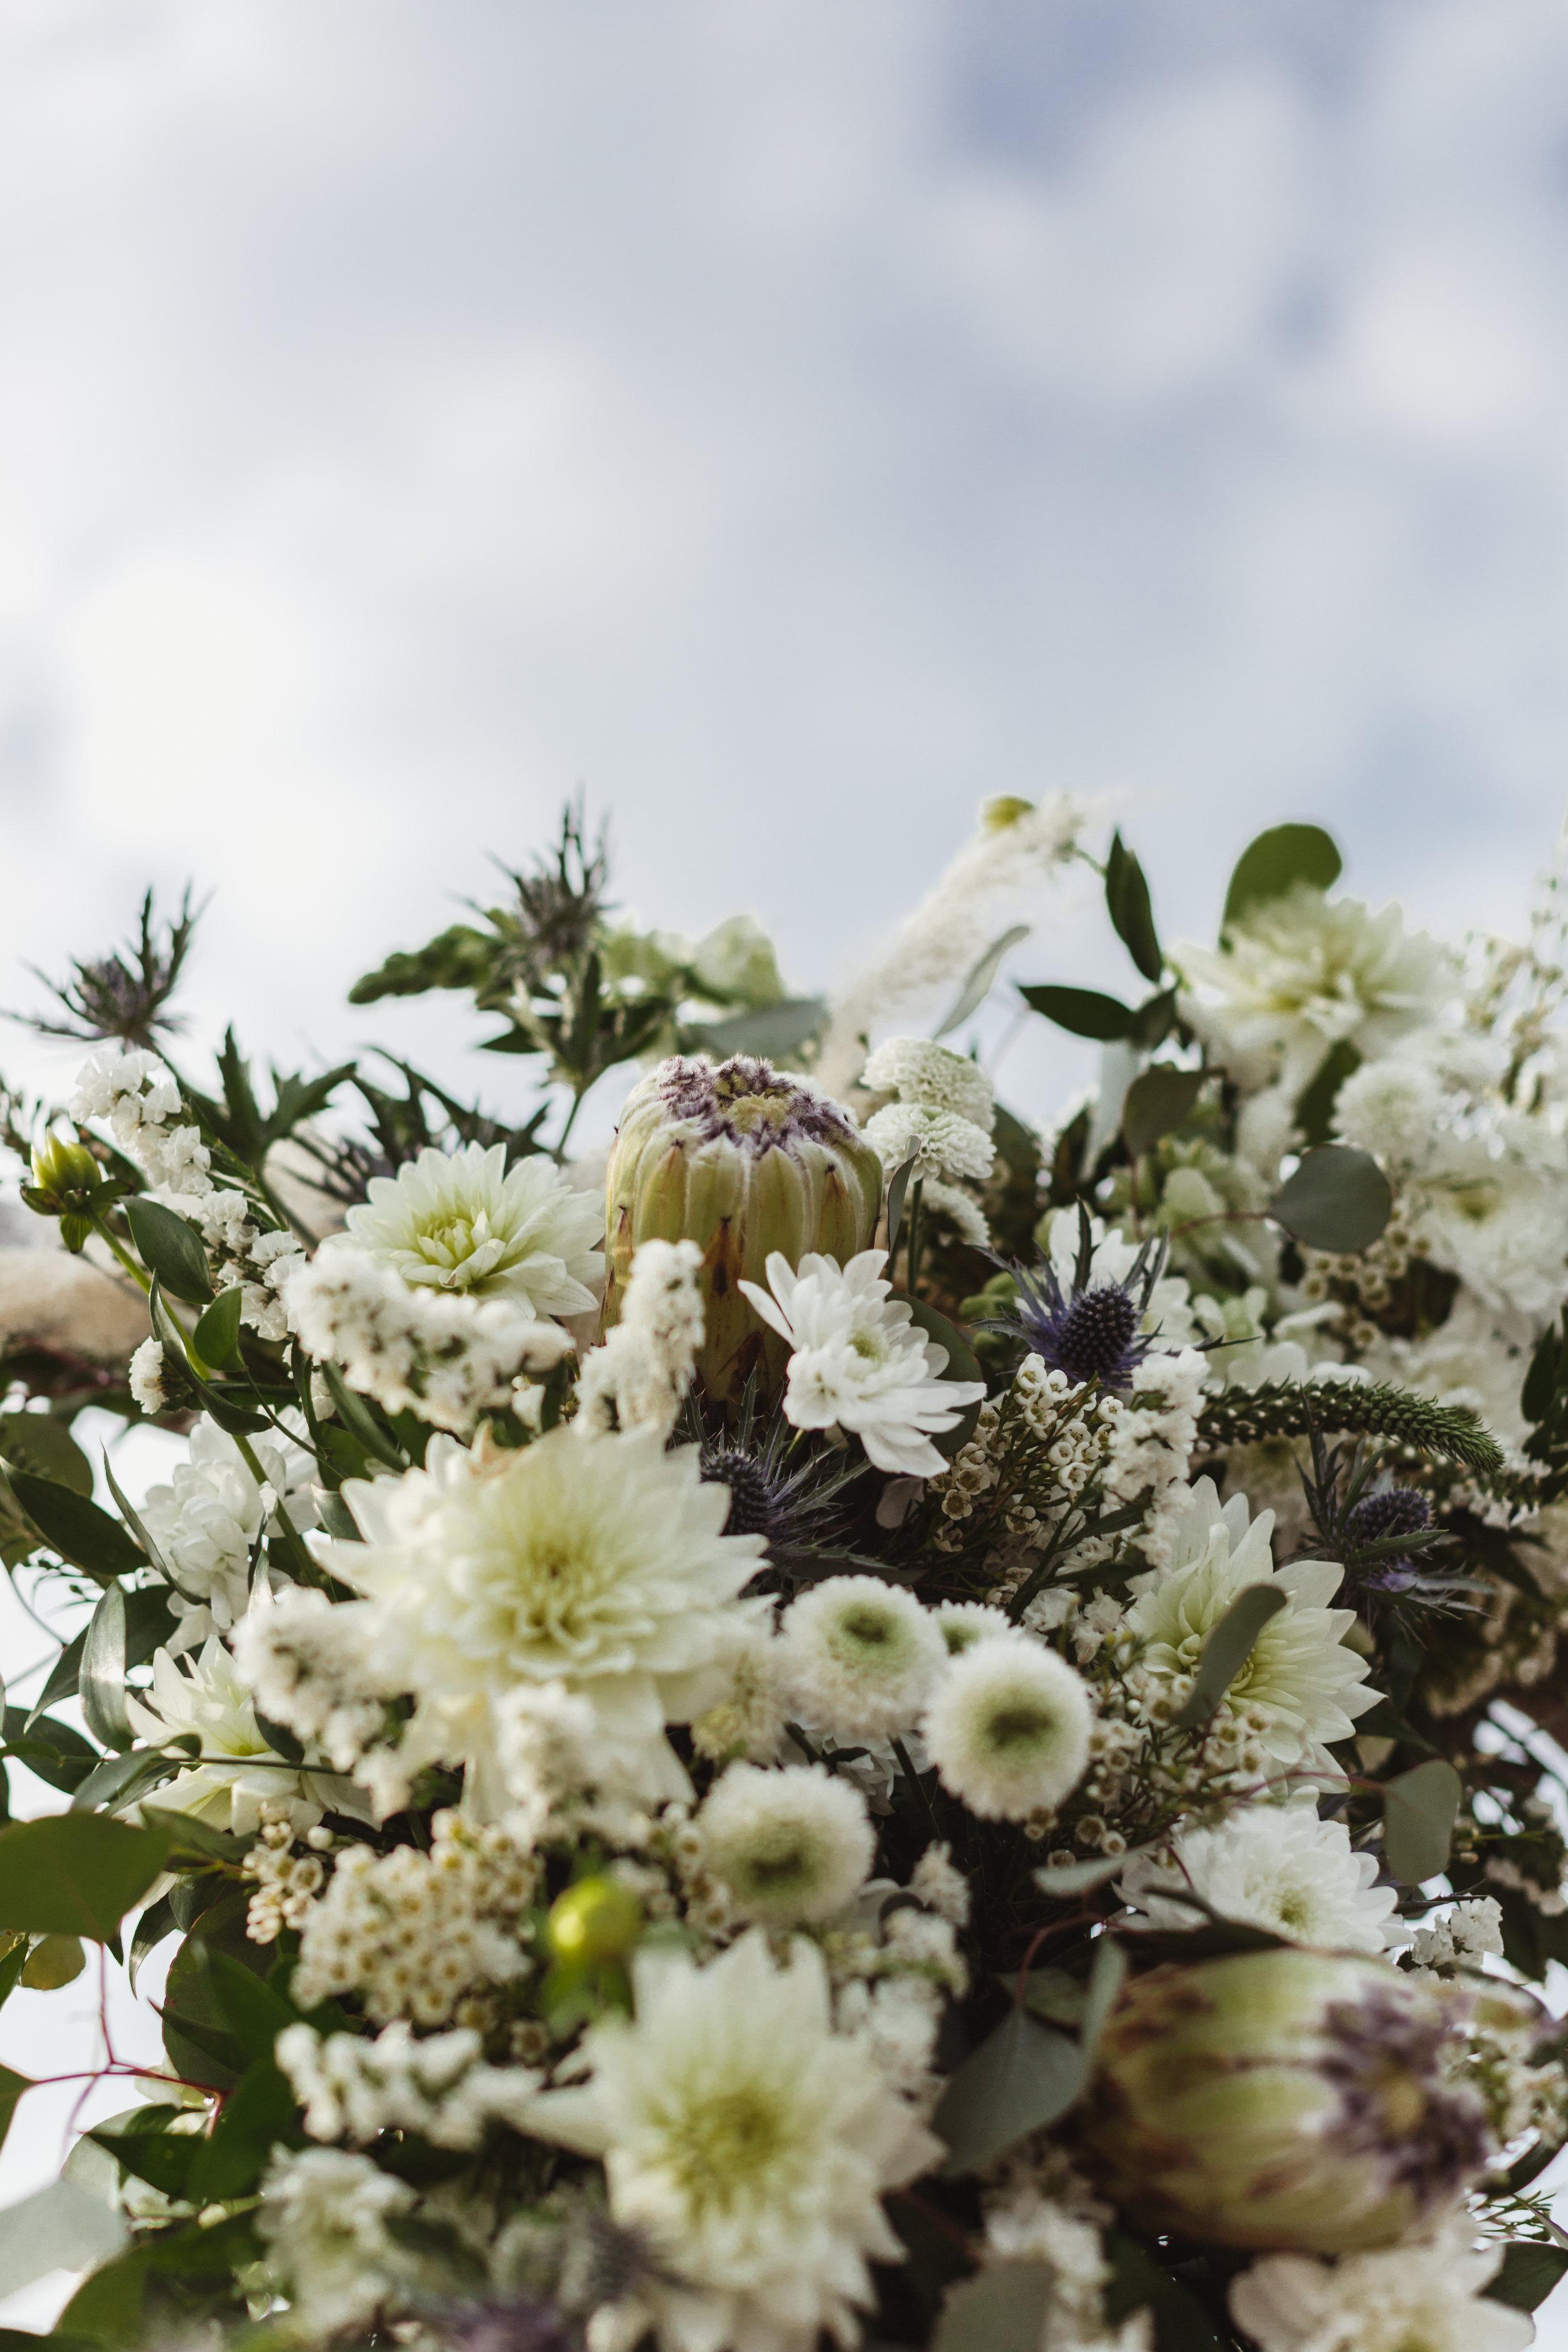 Jamie_English_Photography_JordanErik_Dos_Pueblos_Orchid_Wedding_Santa_Barbara_Fall2018-275.jpg